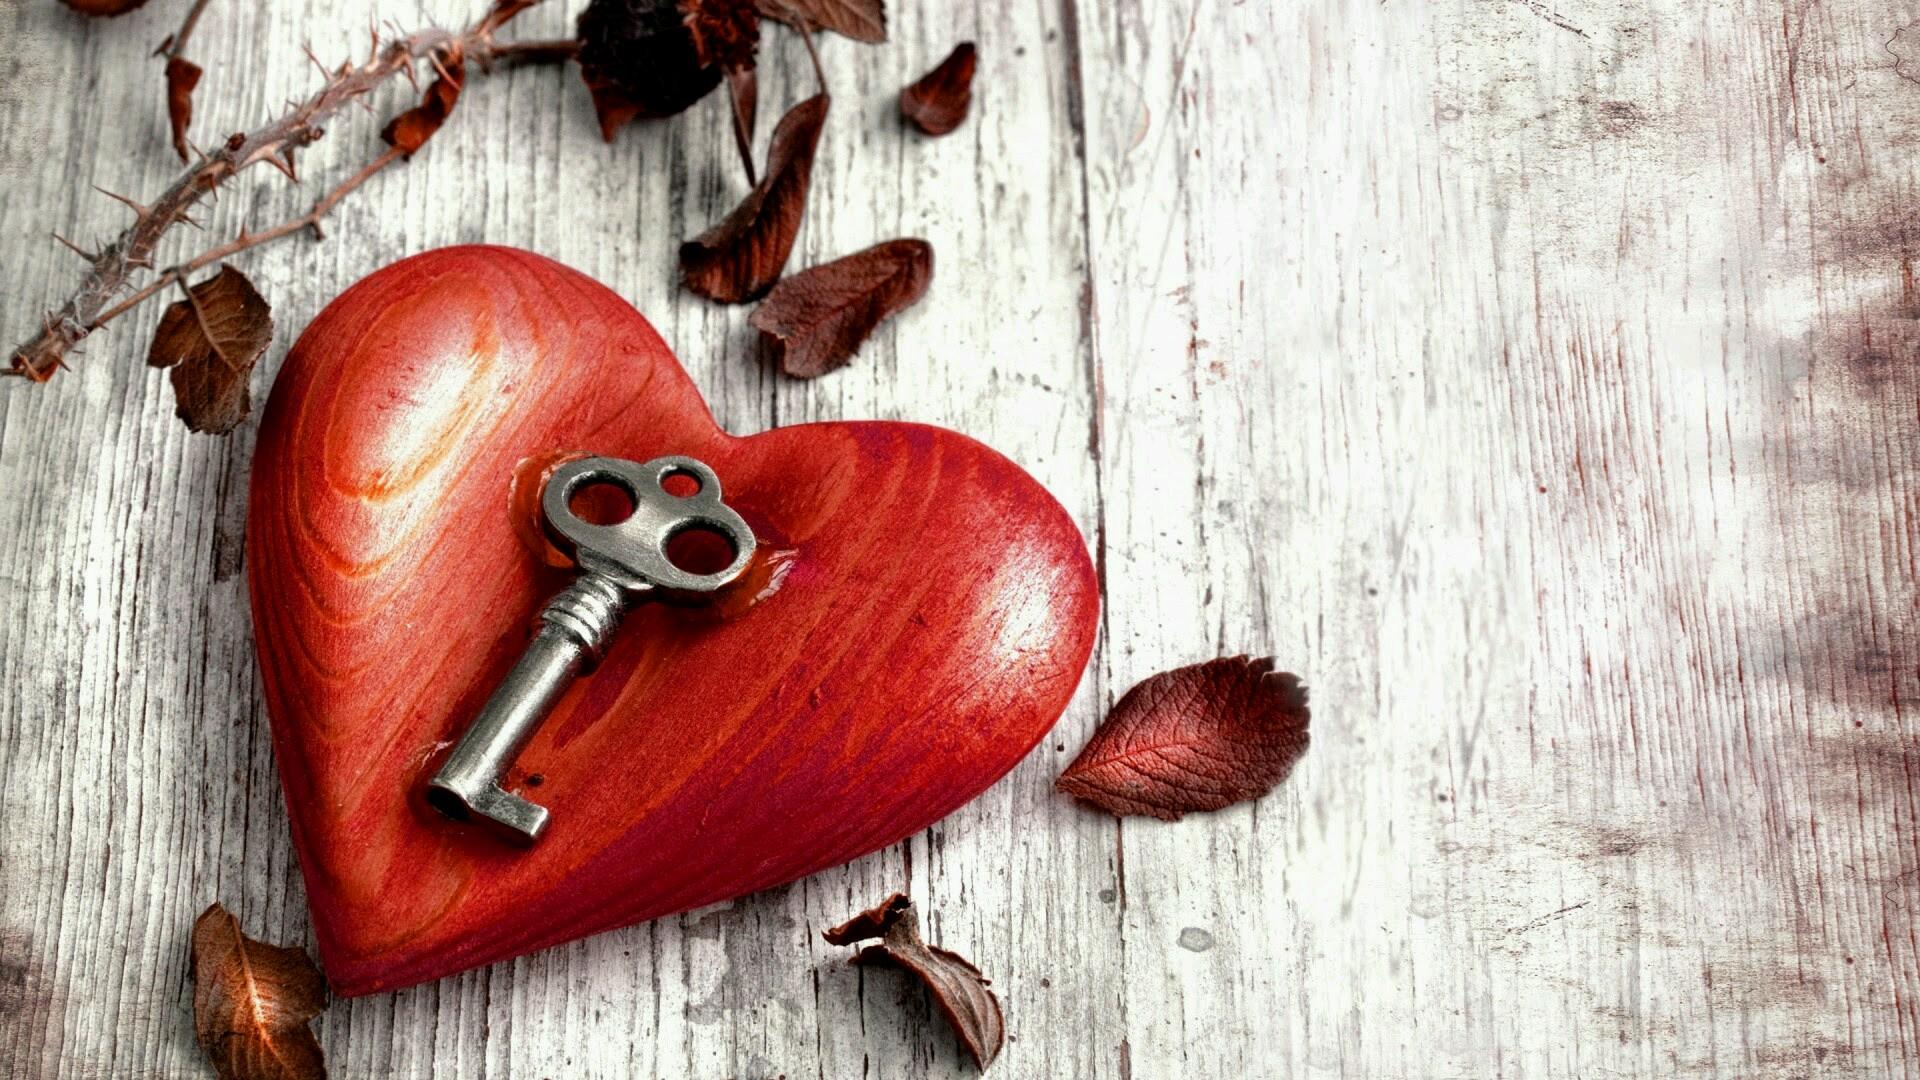 تصویر کلید قلب